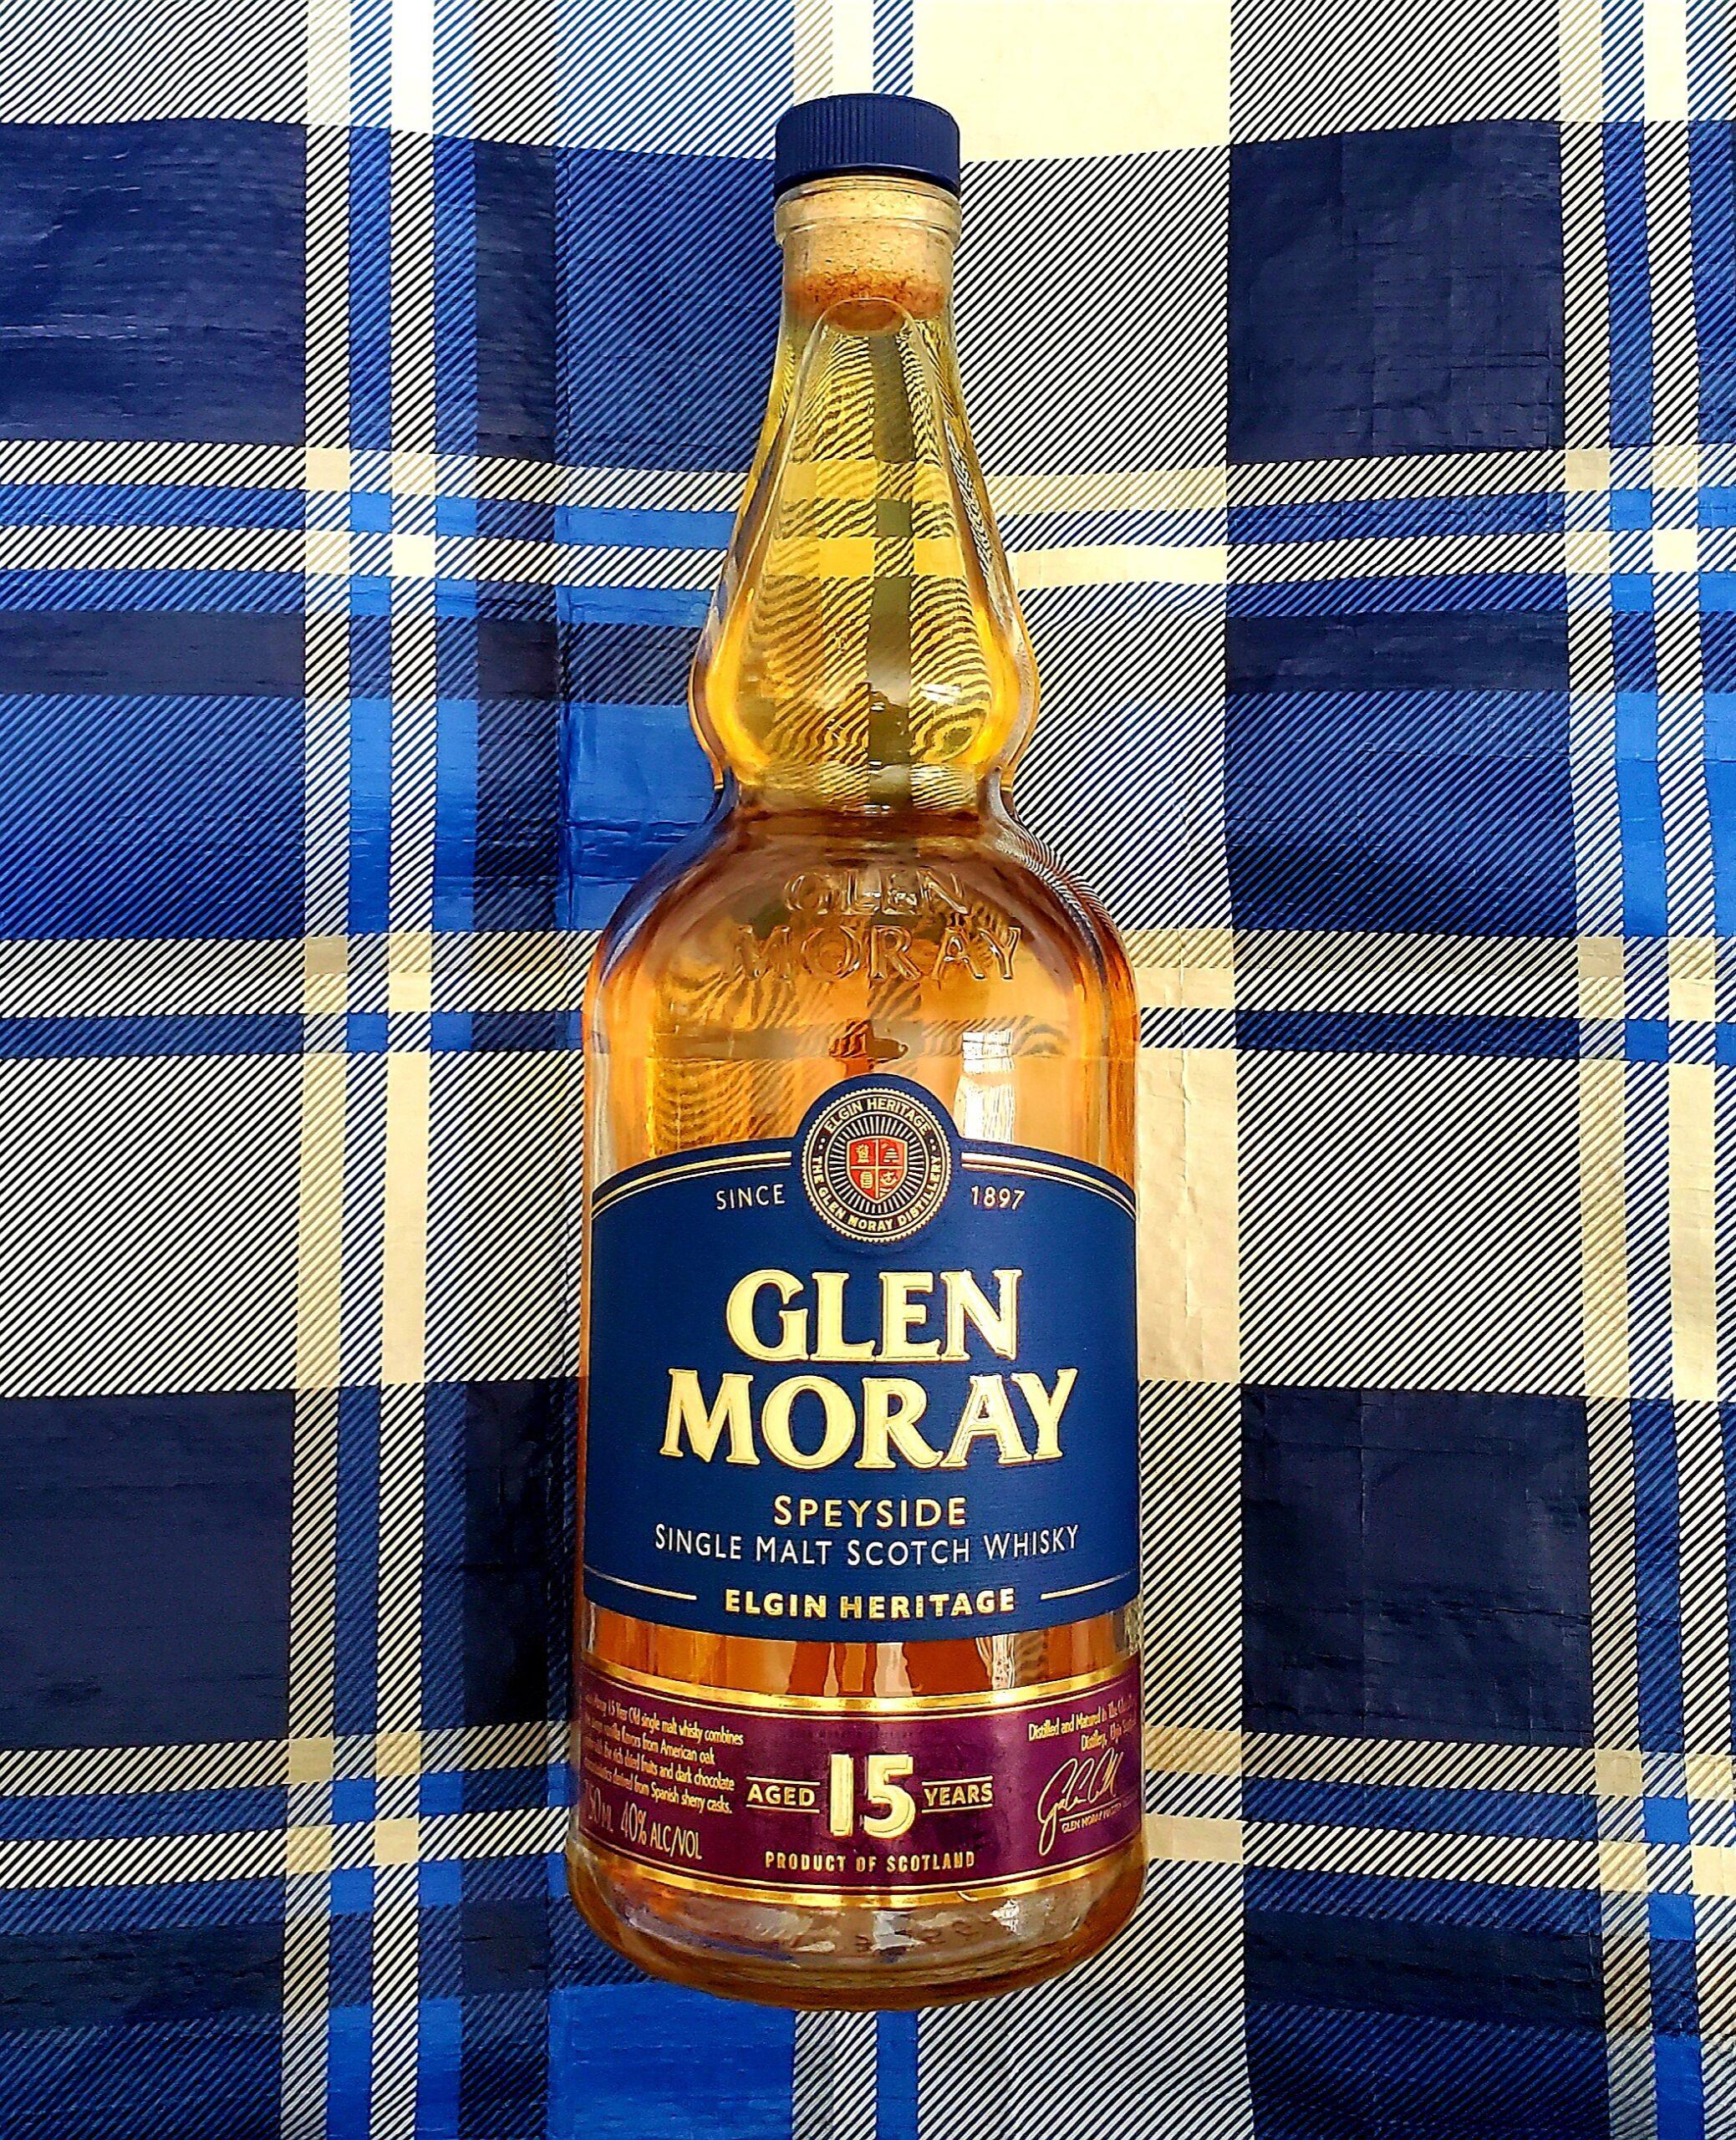 Glen Moray 15yr The Whiskey Noob Review